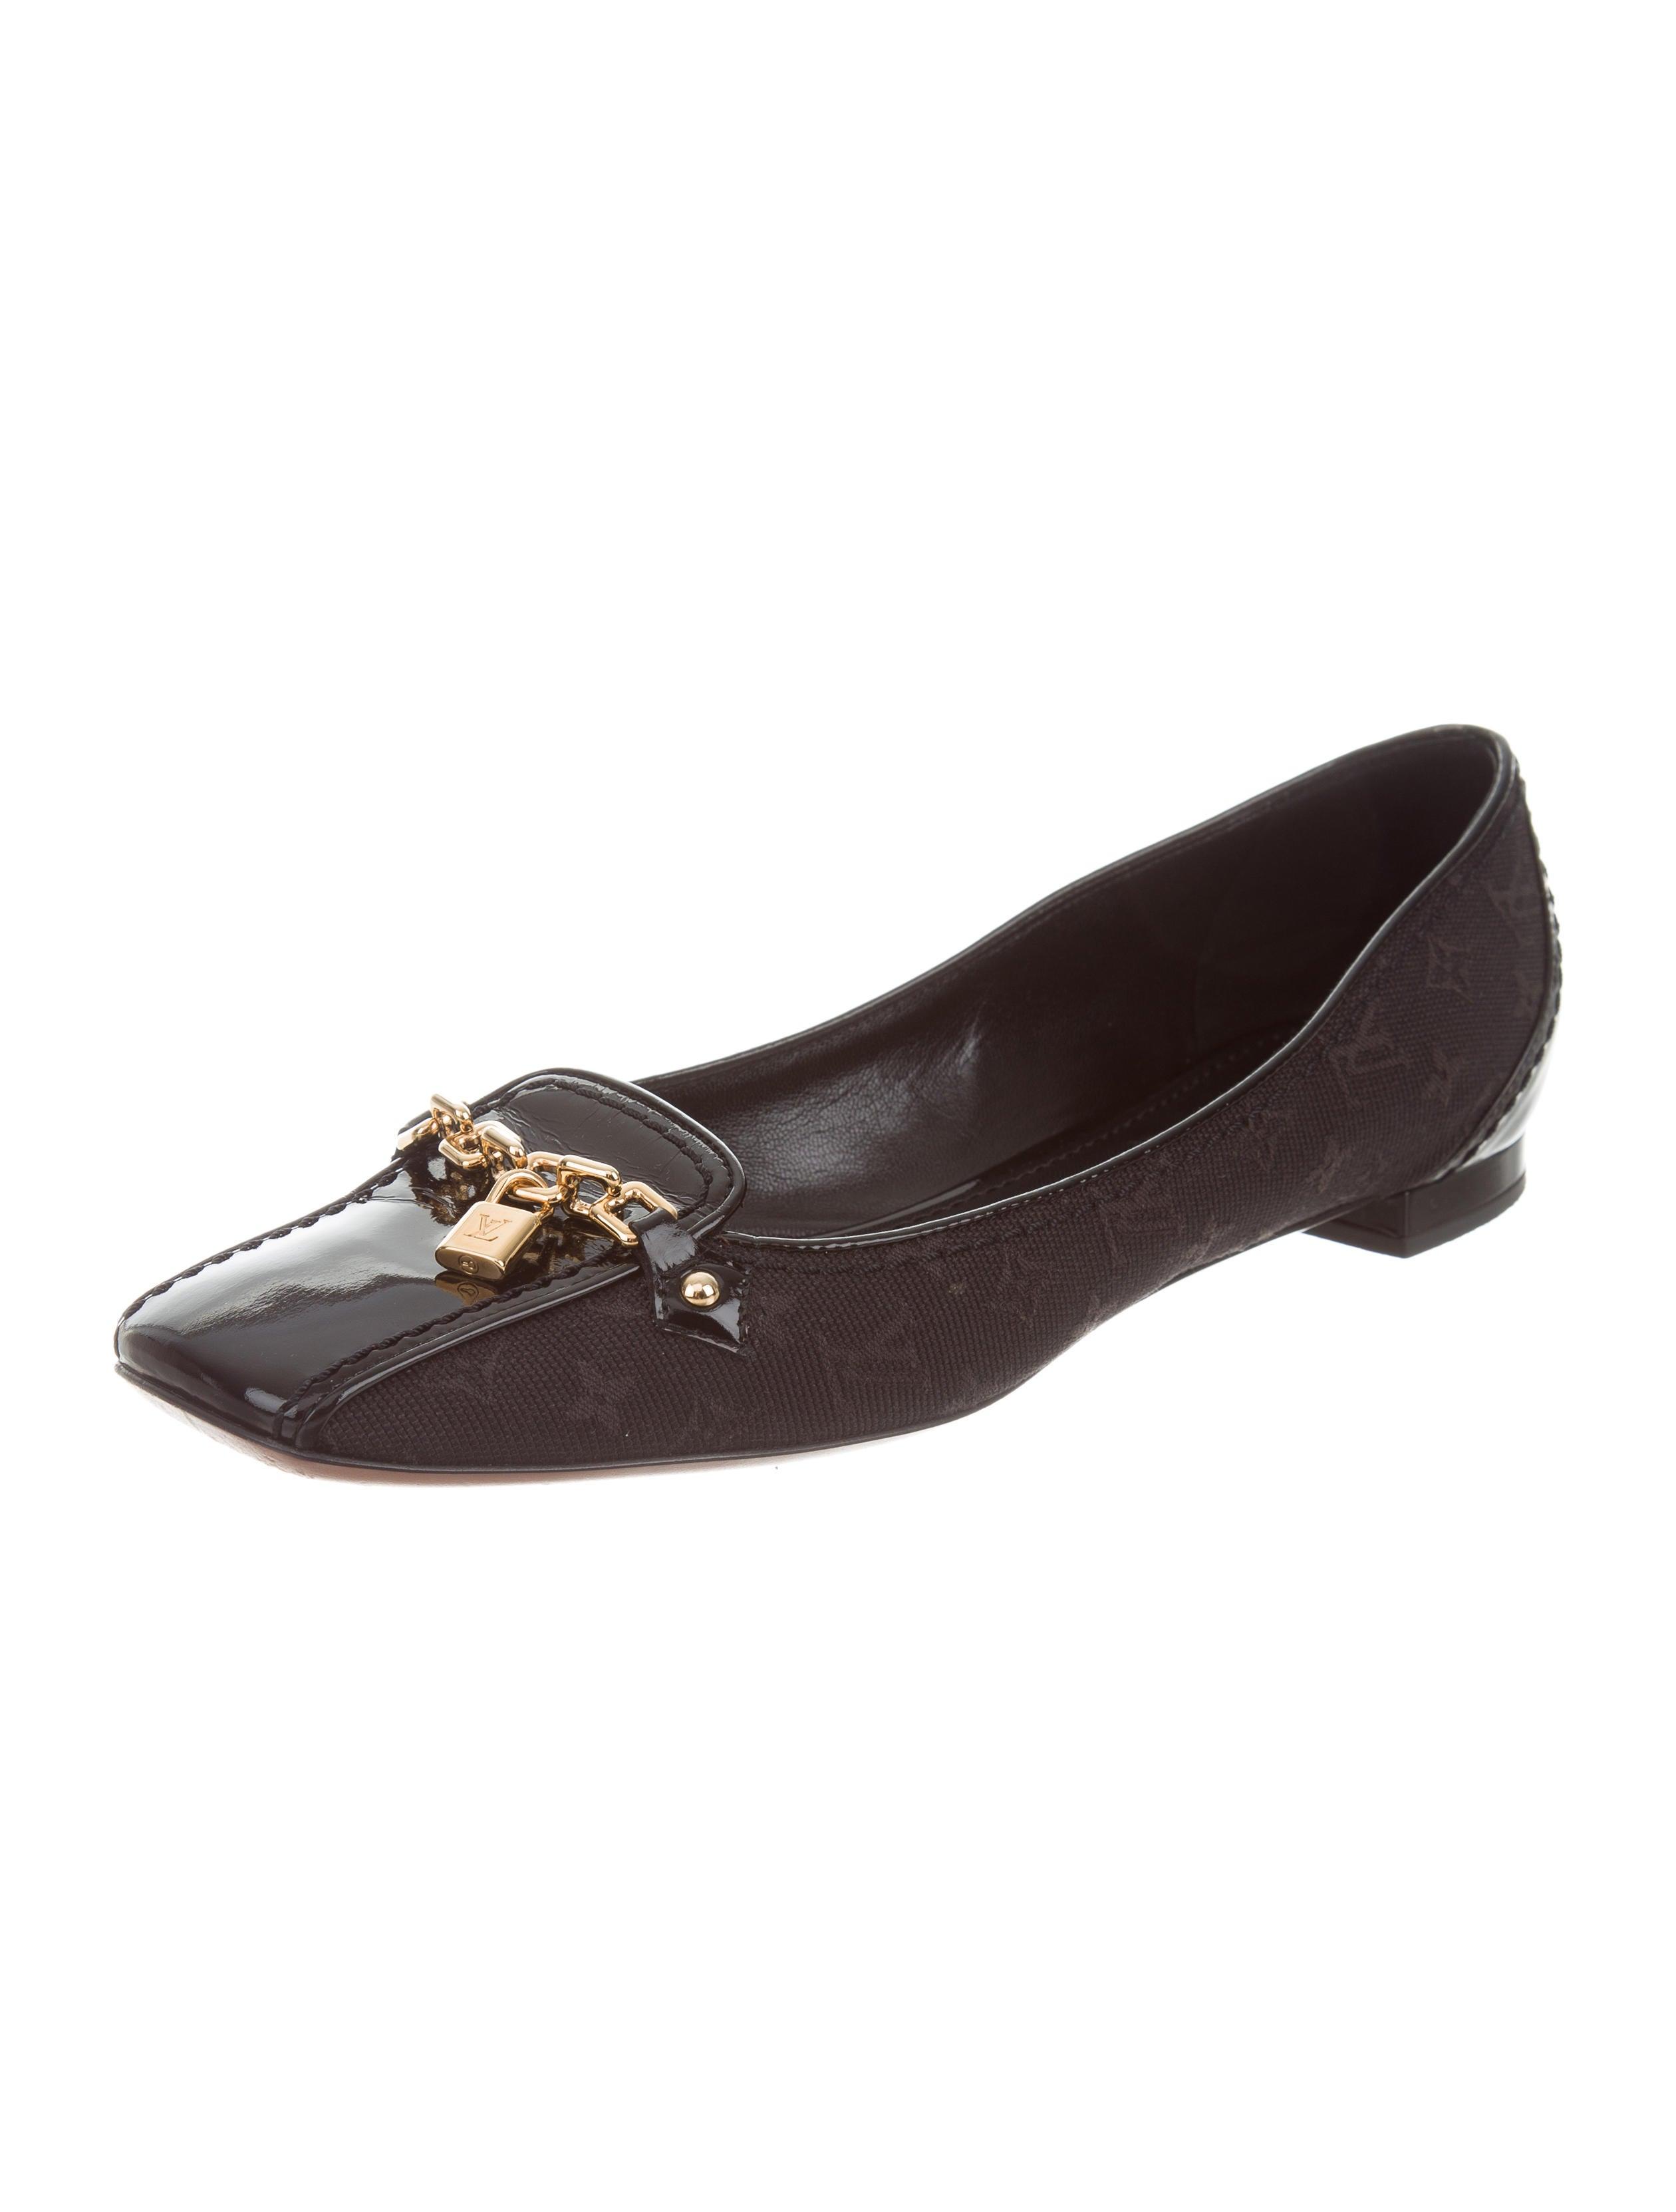 Louis vuitton loafers women